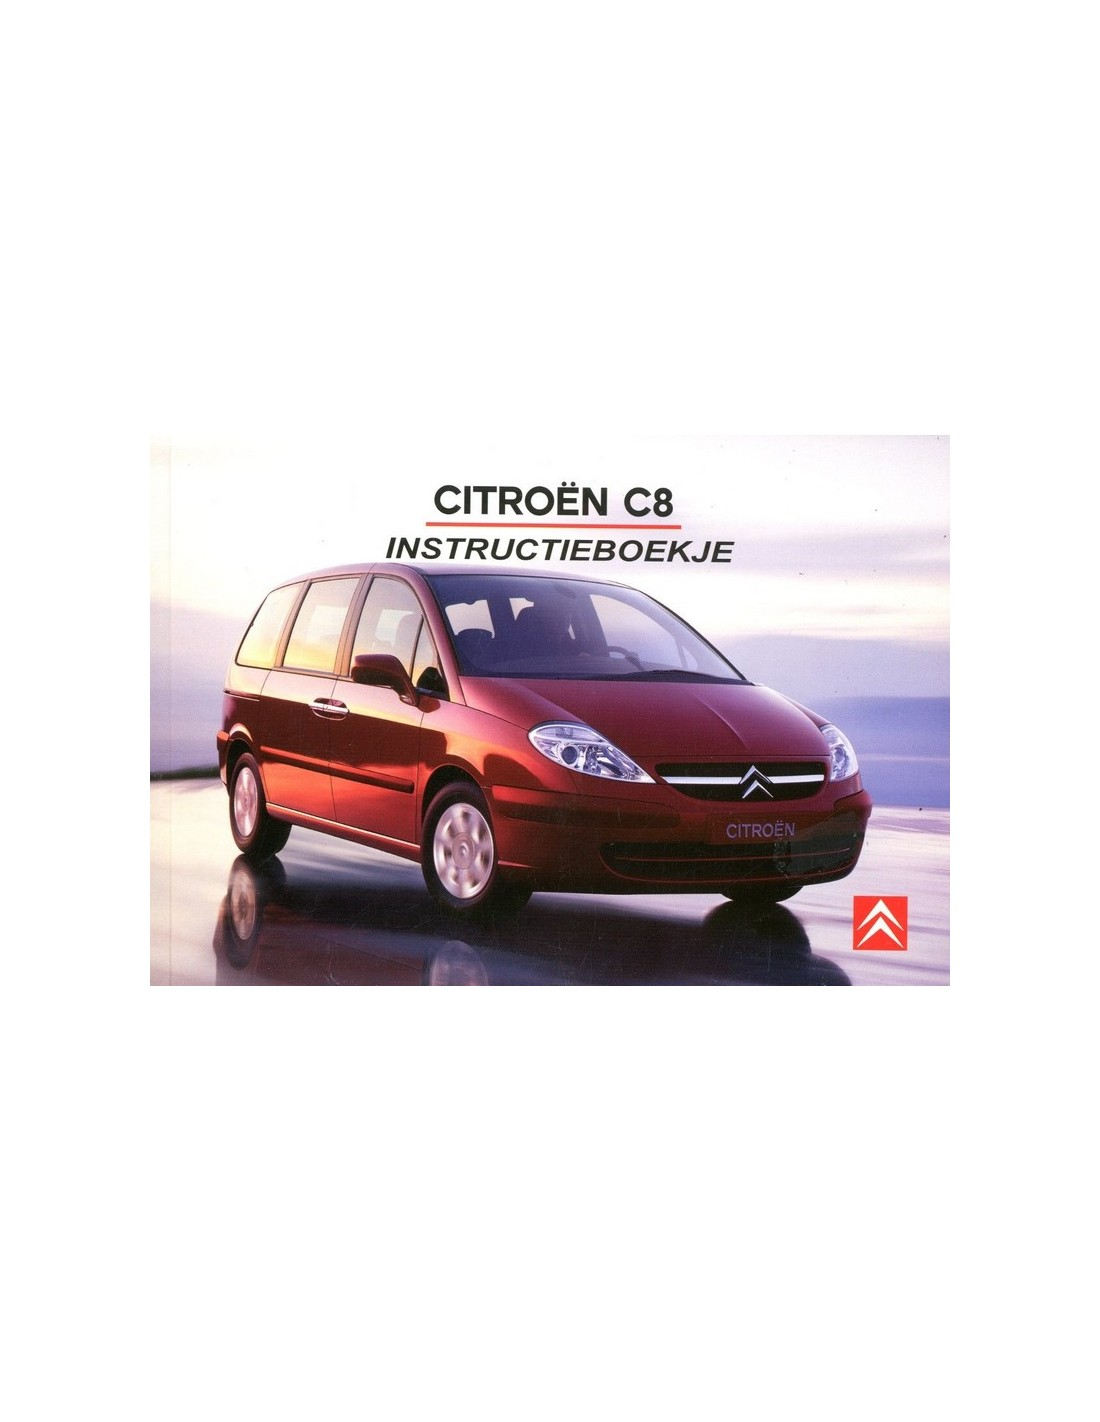 2006 CITROEN C8 OWNER'S MANUAL DUTCH